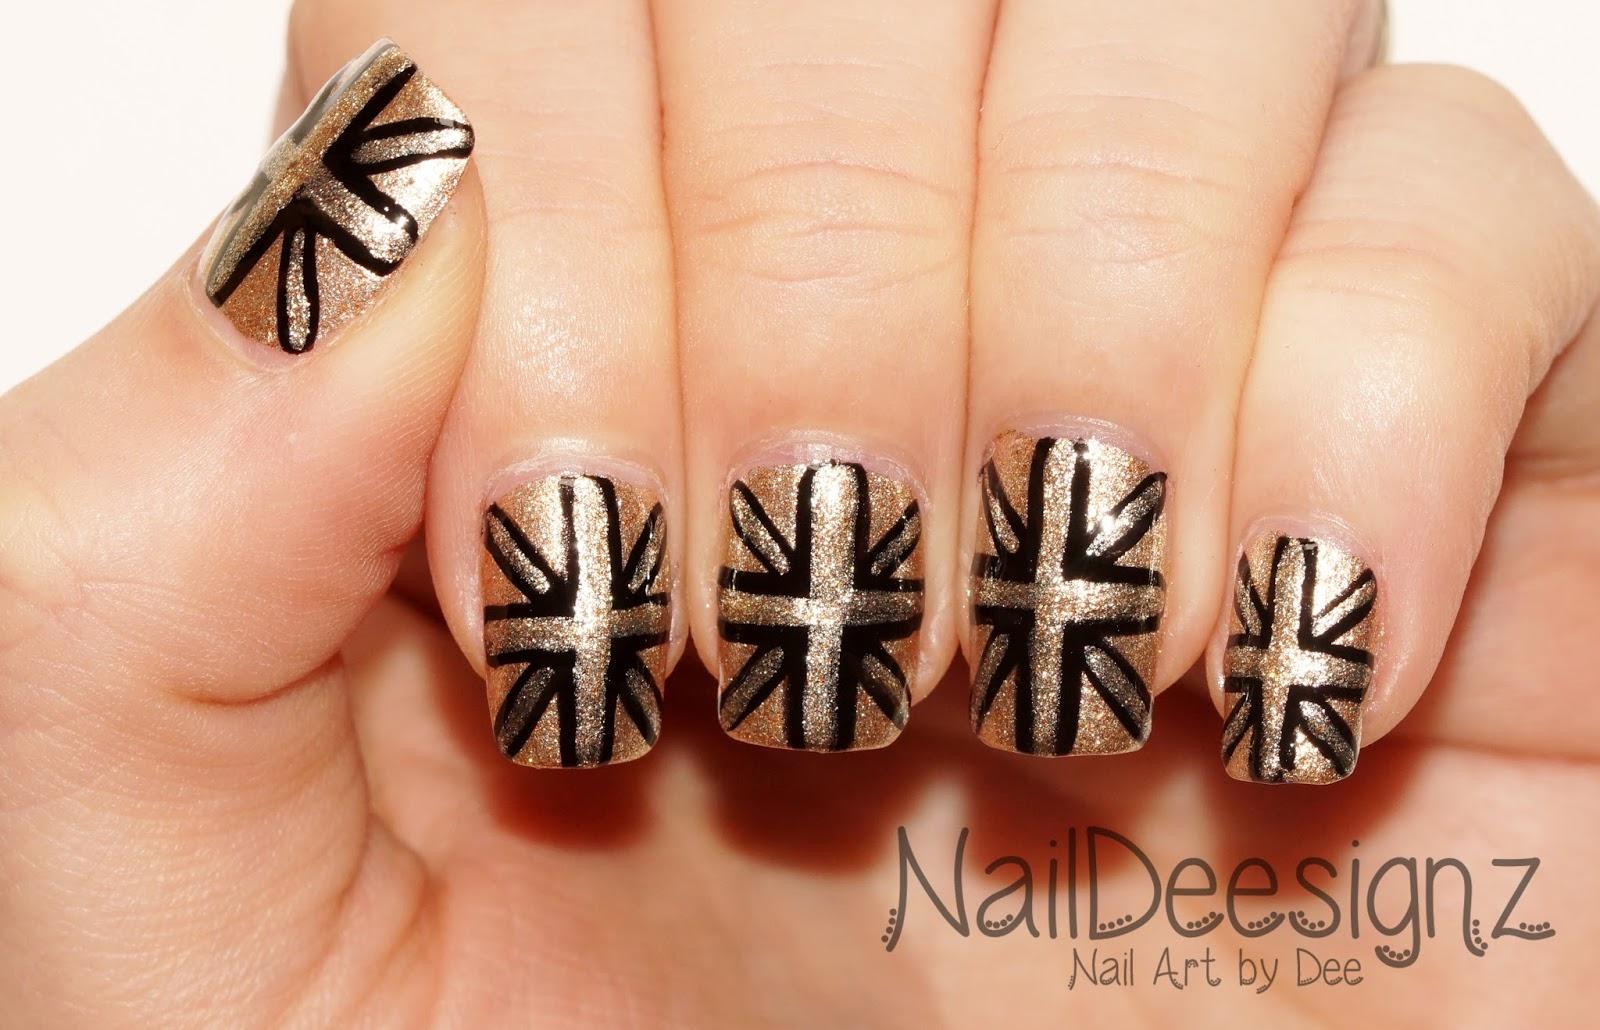 Naildeesignz Black Gold Union Jack Nail Art